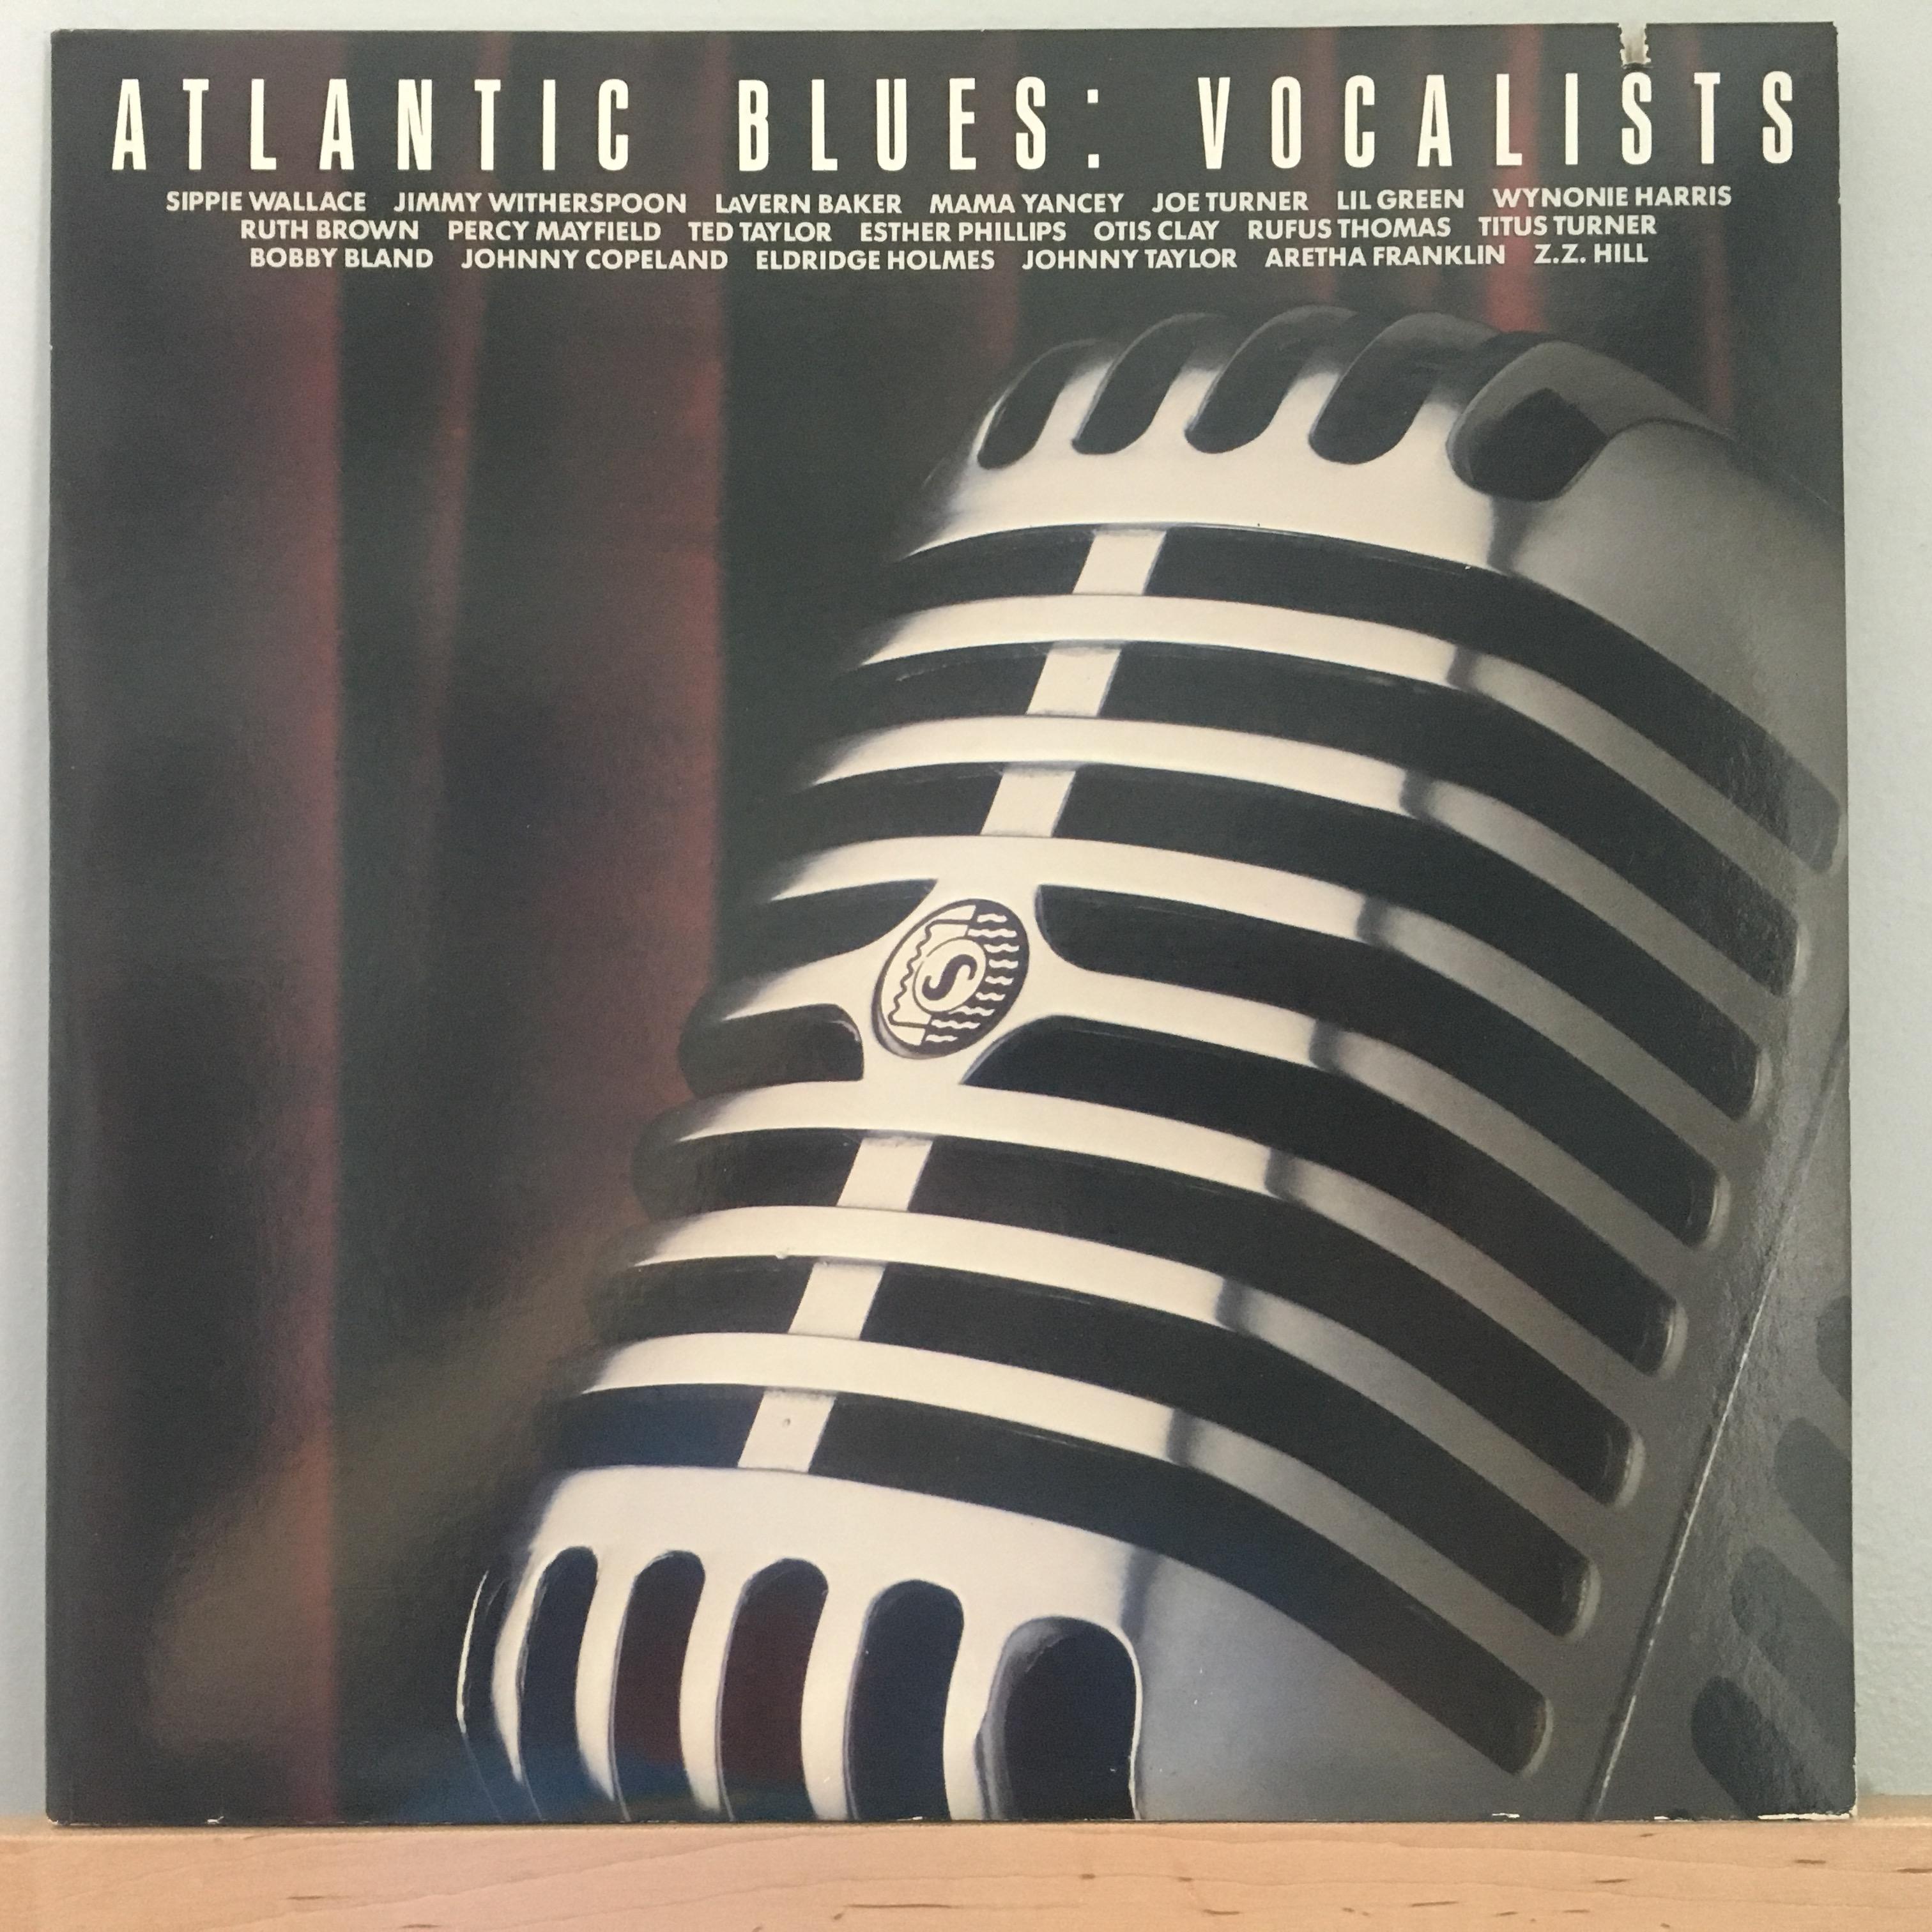 Atlantic Blues: Vocalists front cover